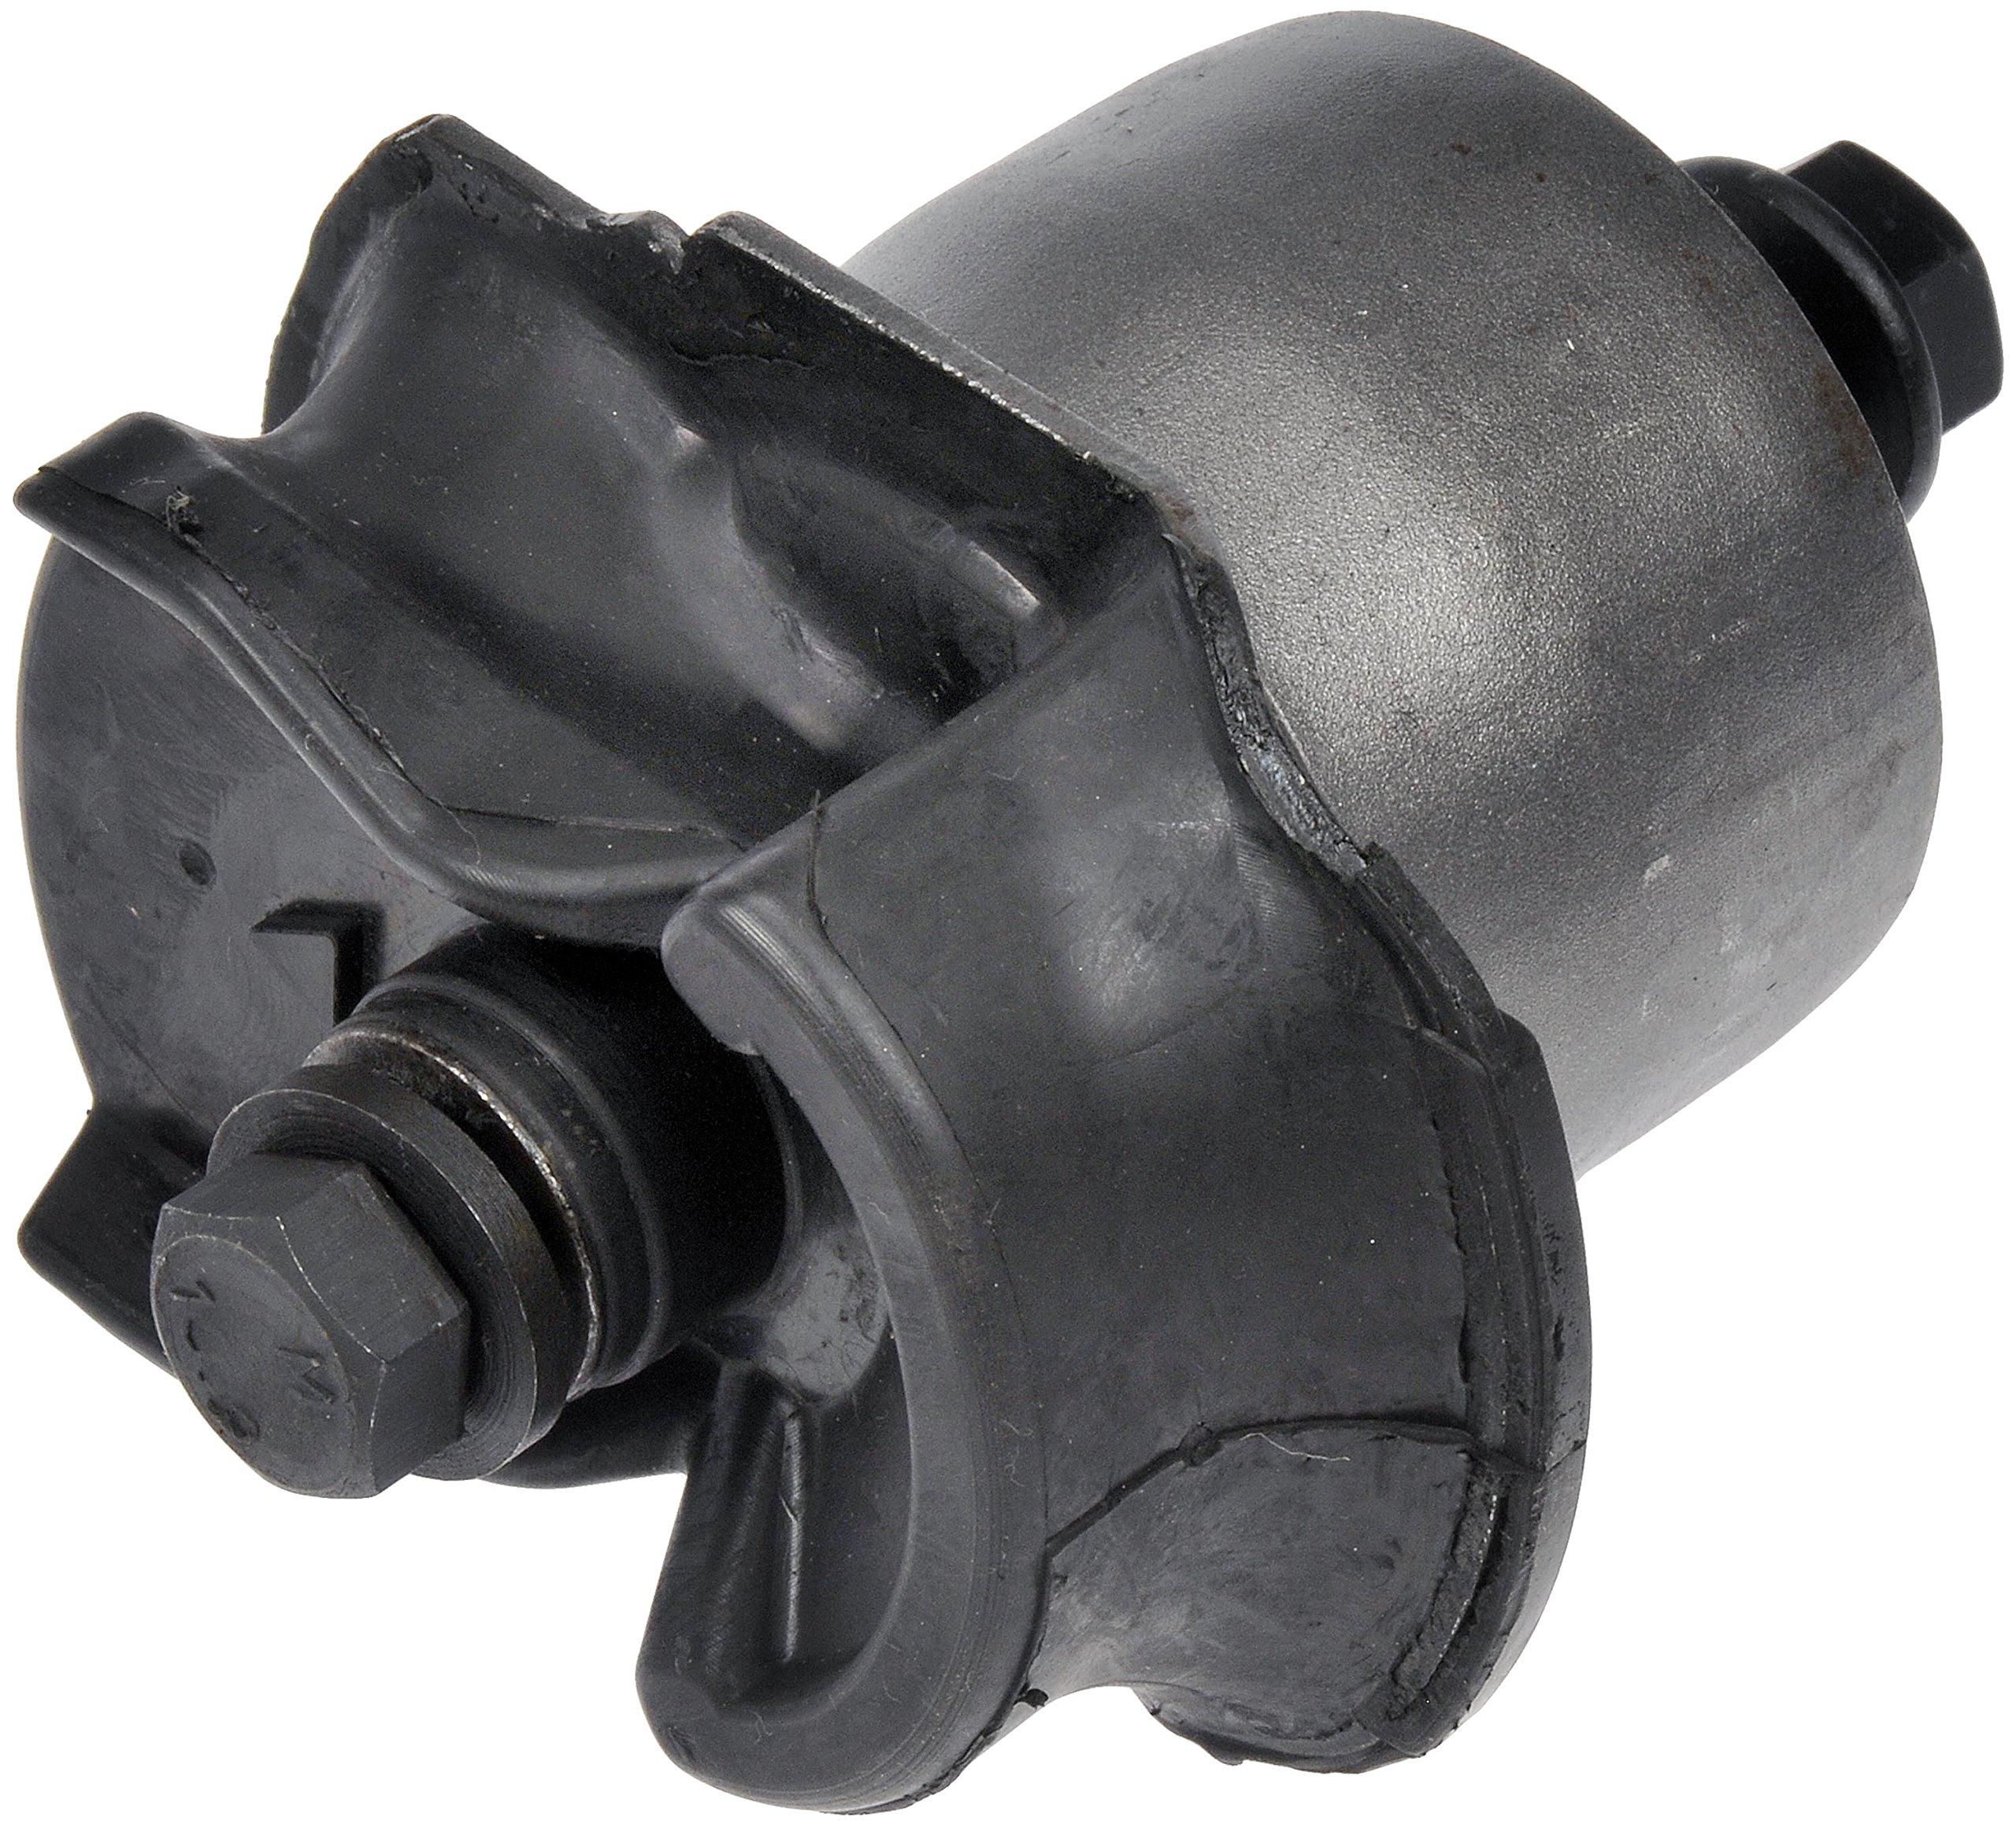 Dorman 523-068 Rear Axle Pivot Bushing